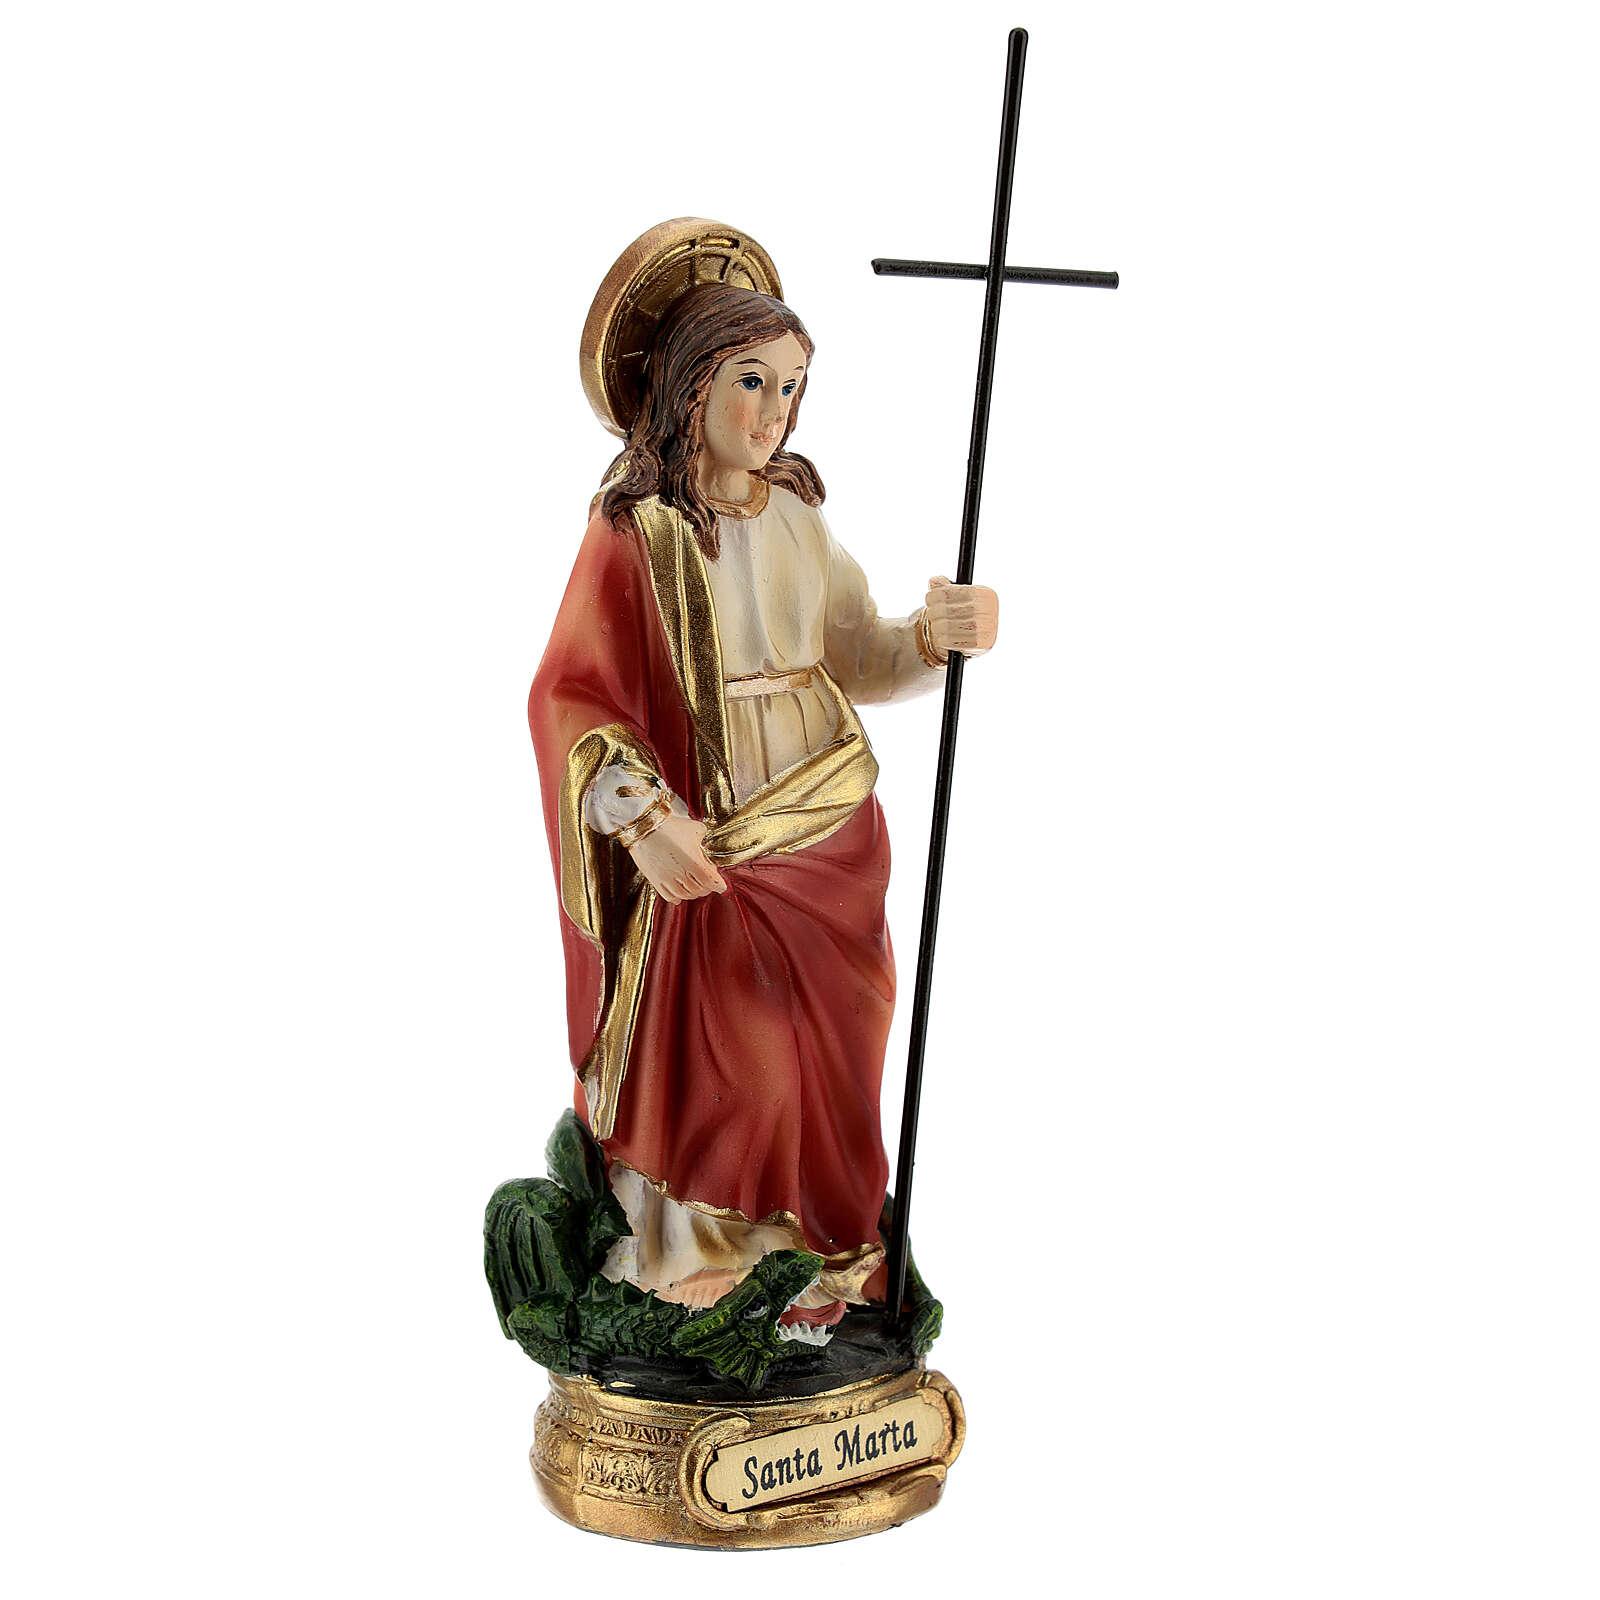 Saint Martha defeats the Tarasque resin statue 12.5 cm 4